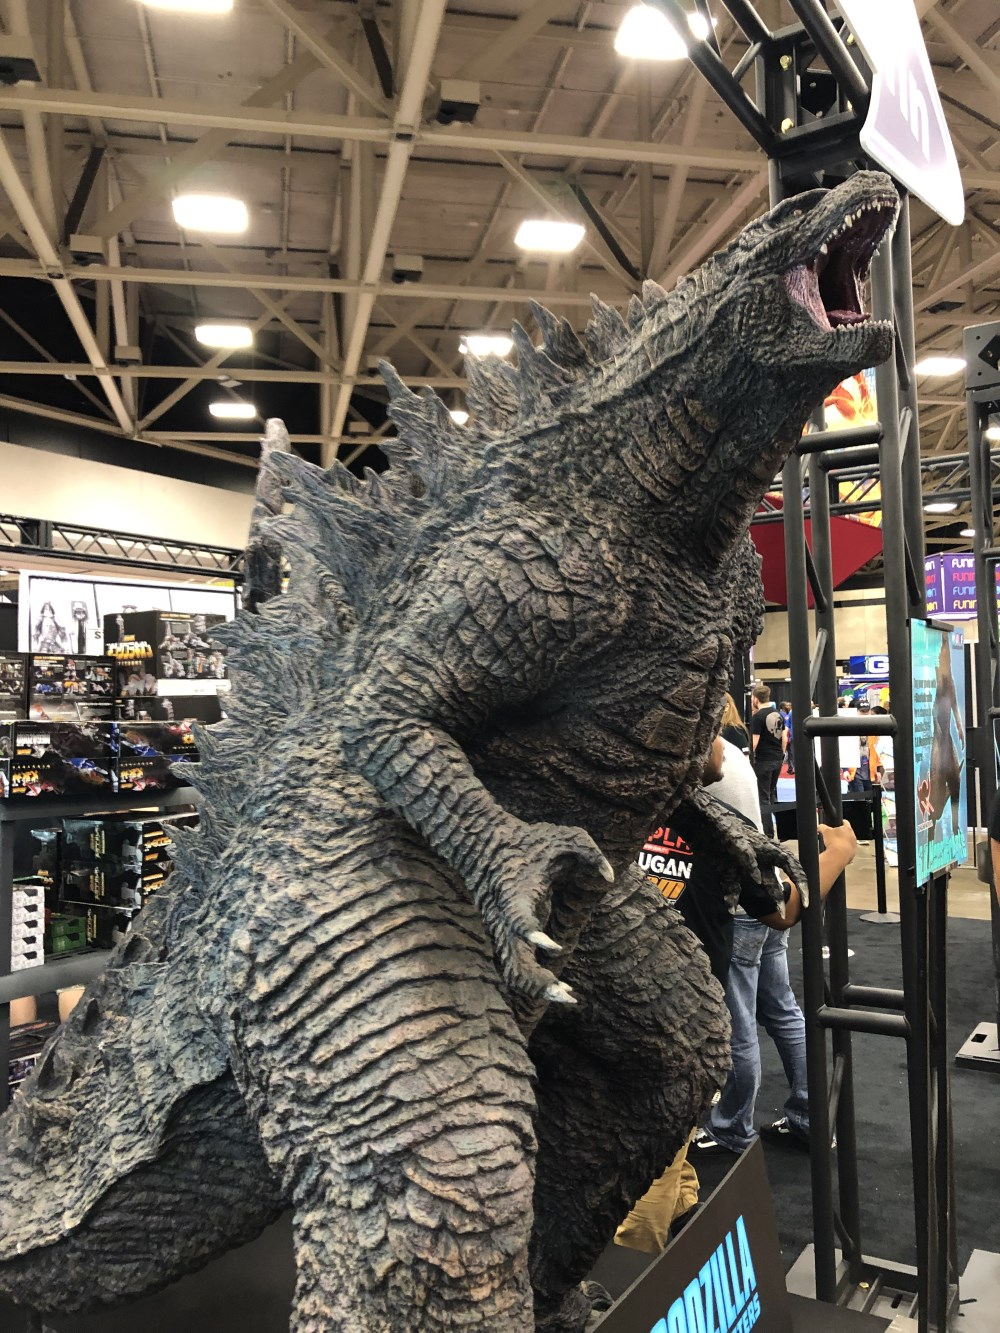 Fan Expo Dallas 2019 - Godzilla